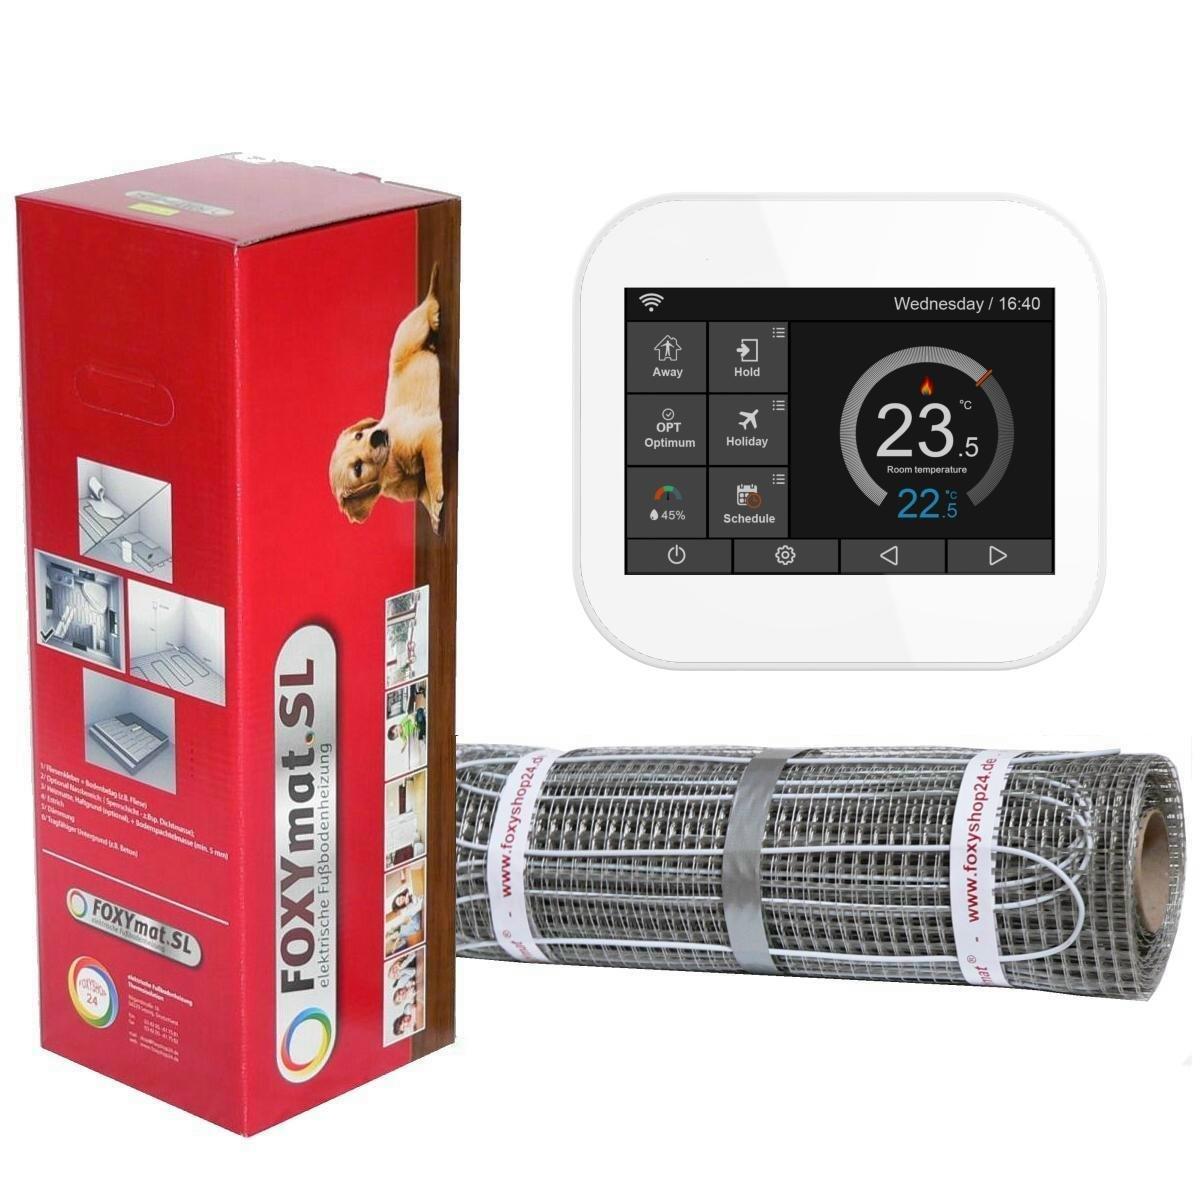 mit Thermostat FOXYREG SPSW,Komplett-Set 0.5m x 14m 7.0 m/² FOXYSHOP24-elektrische Fu/ßbodenheizung PREMIUM MARKE FOXYMAT.SL 160 Watt pro m/²